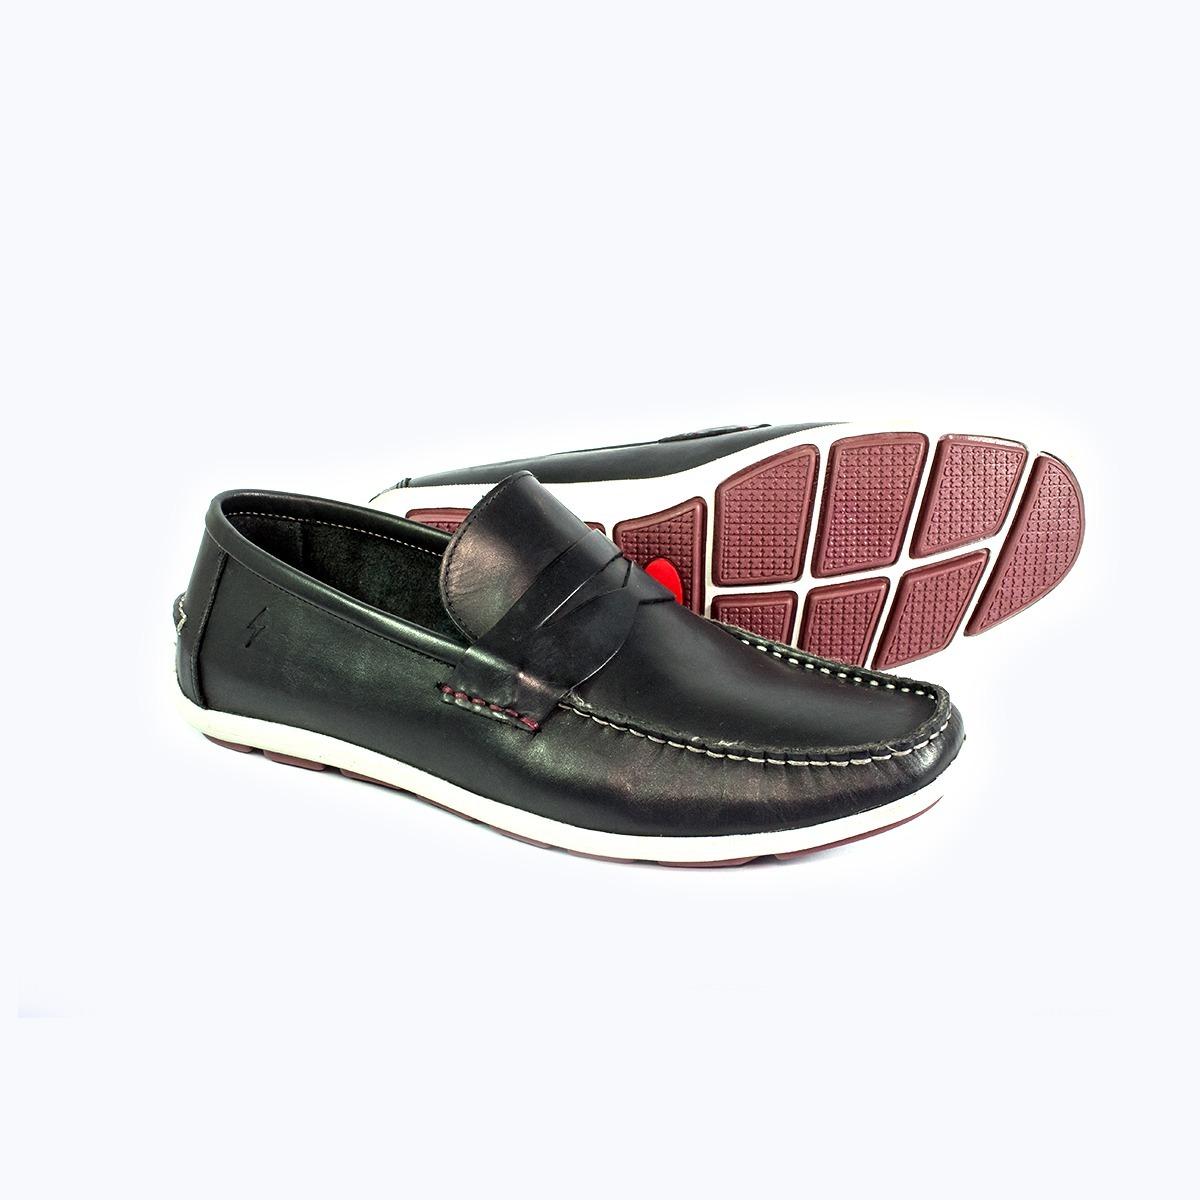 455425f9cd Mocassim Dockside Masculino Bolt Shoes - R  120